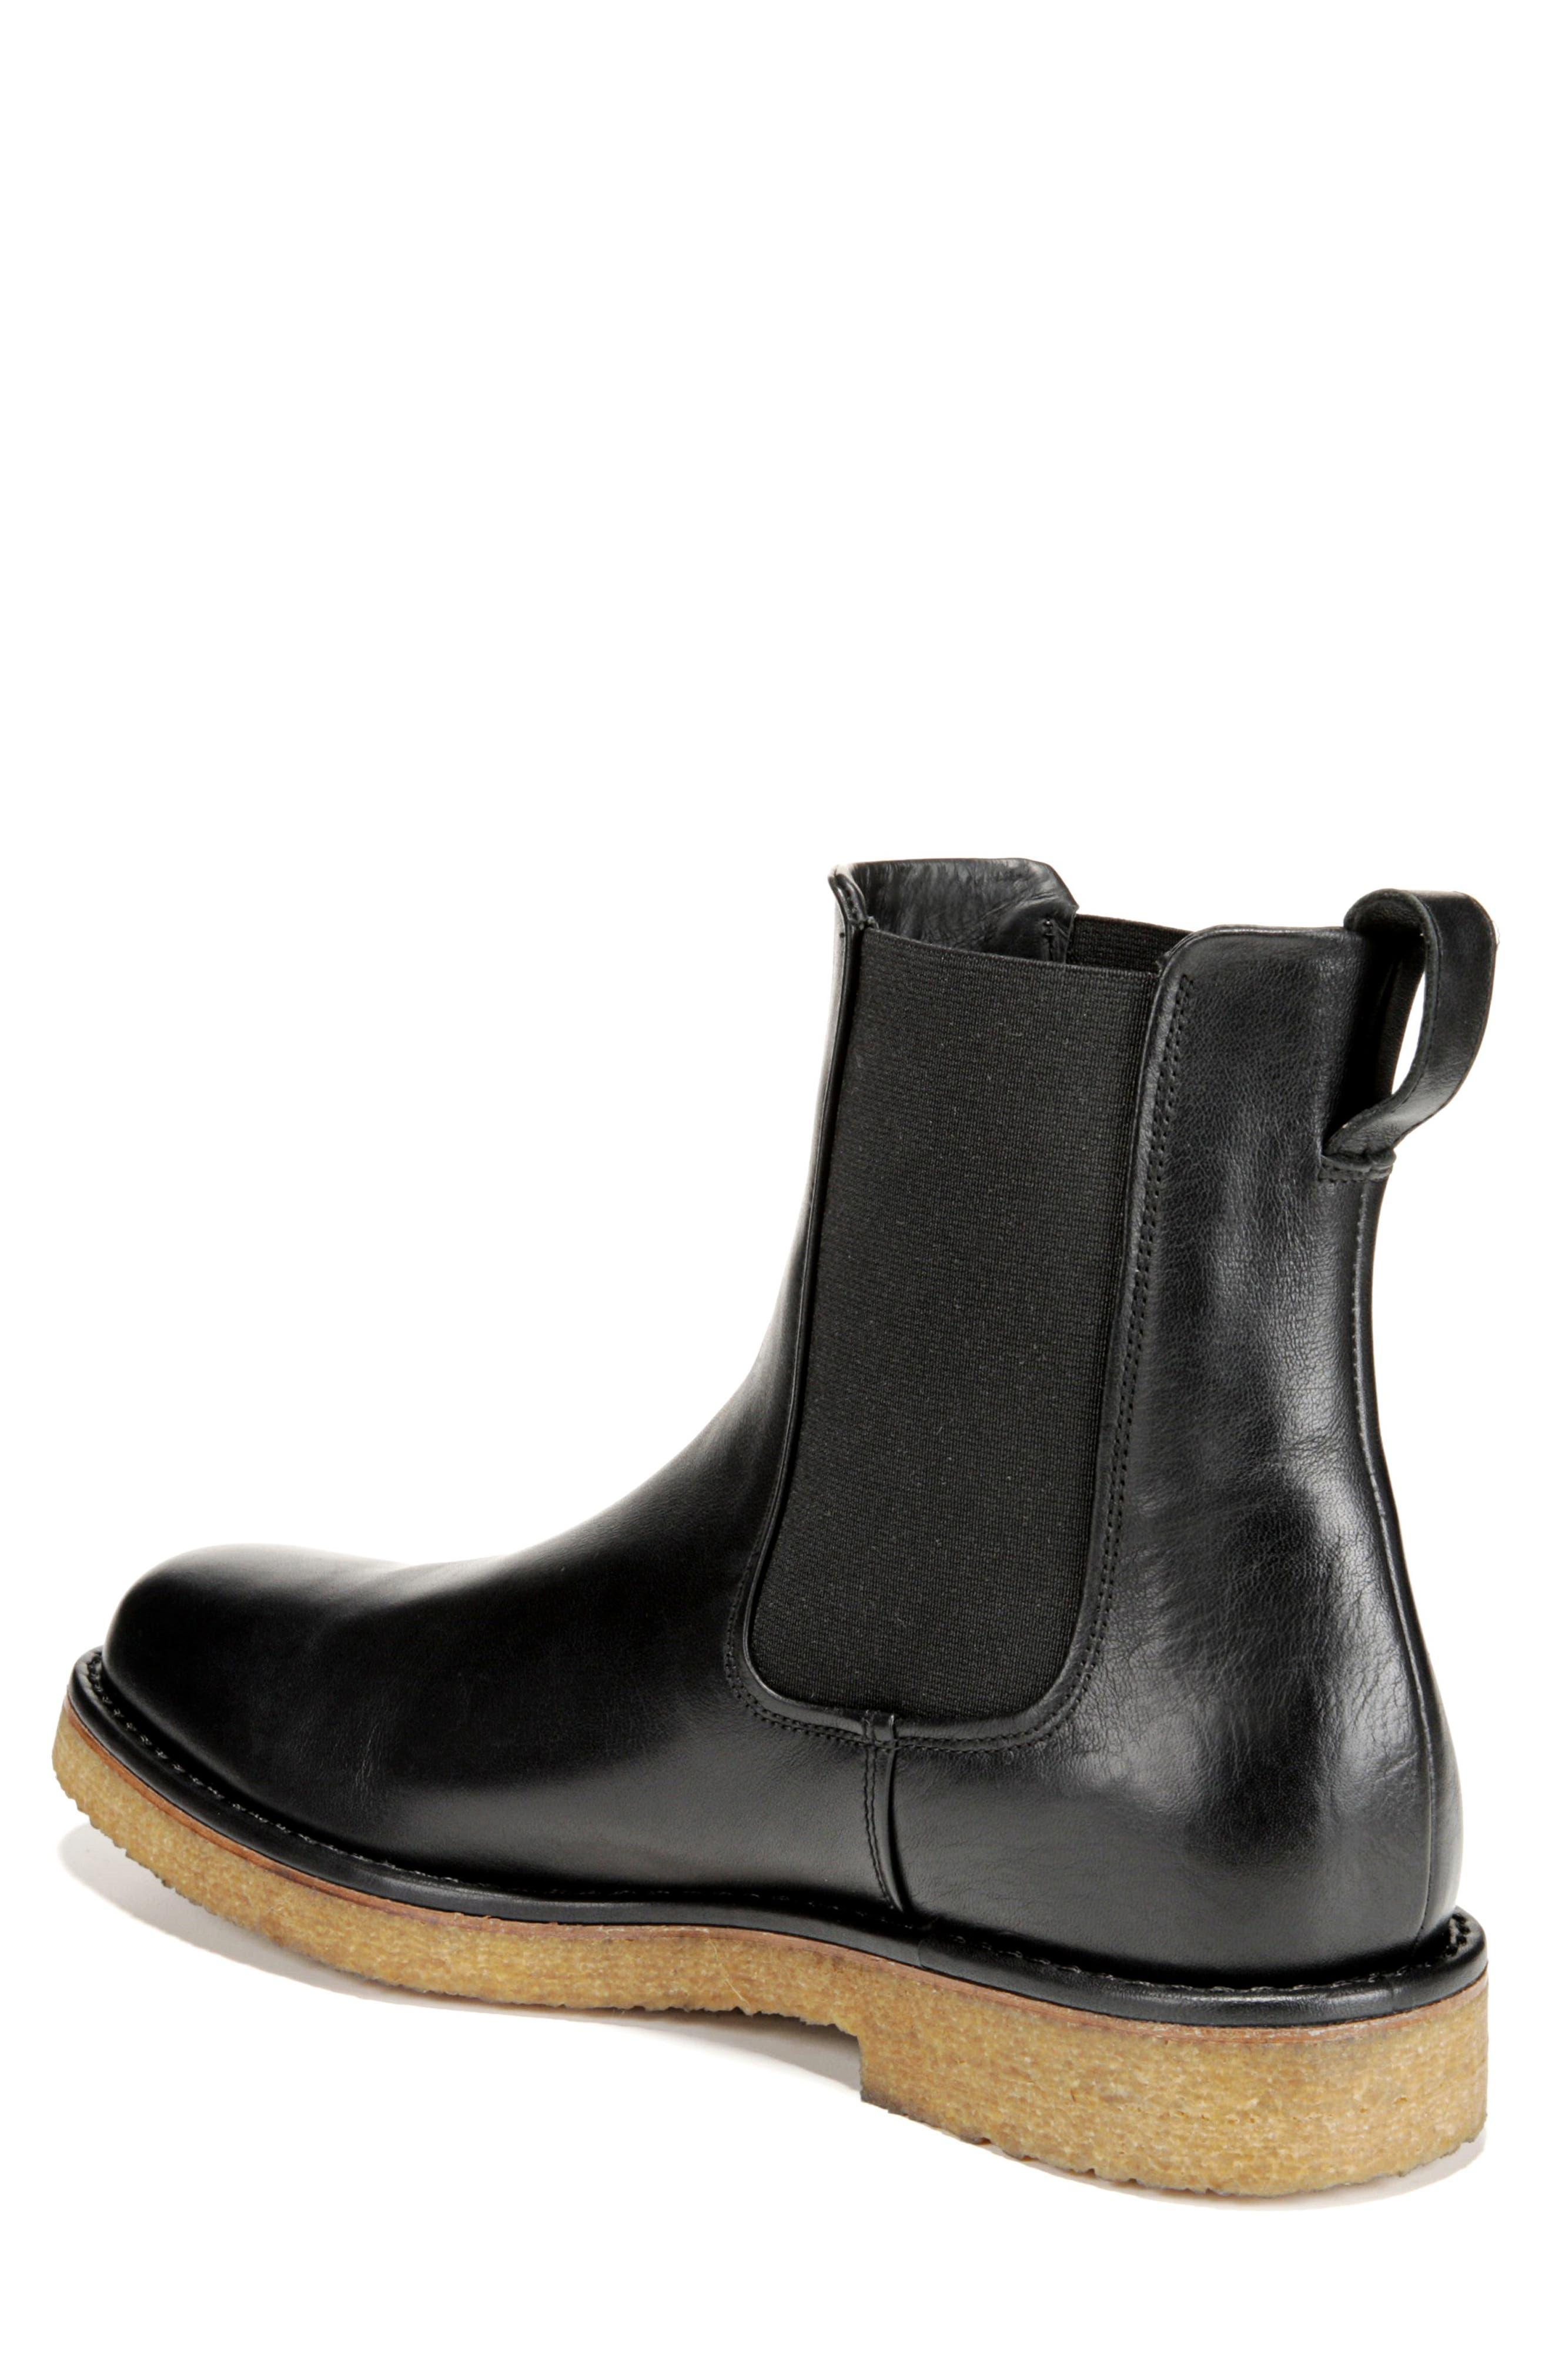 Cresslor Chelsea Boot,                             Alternate thumbnail 2, color,                             BLACK